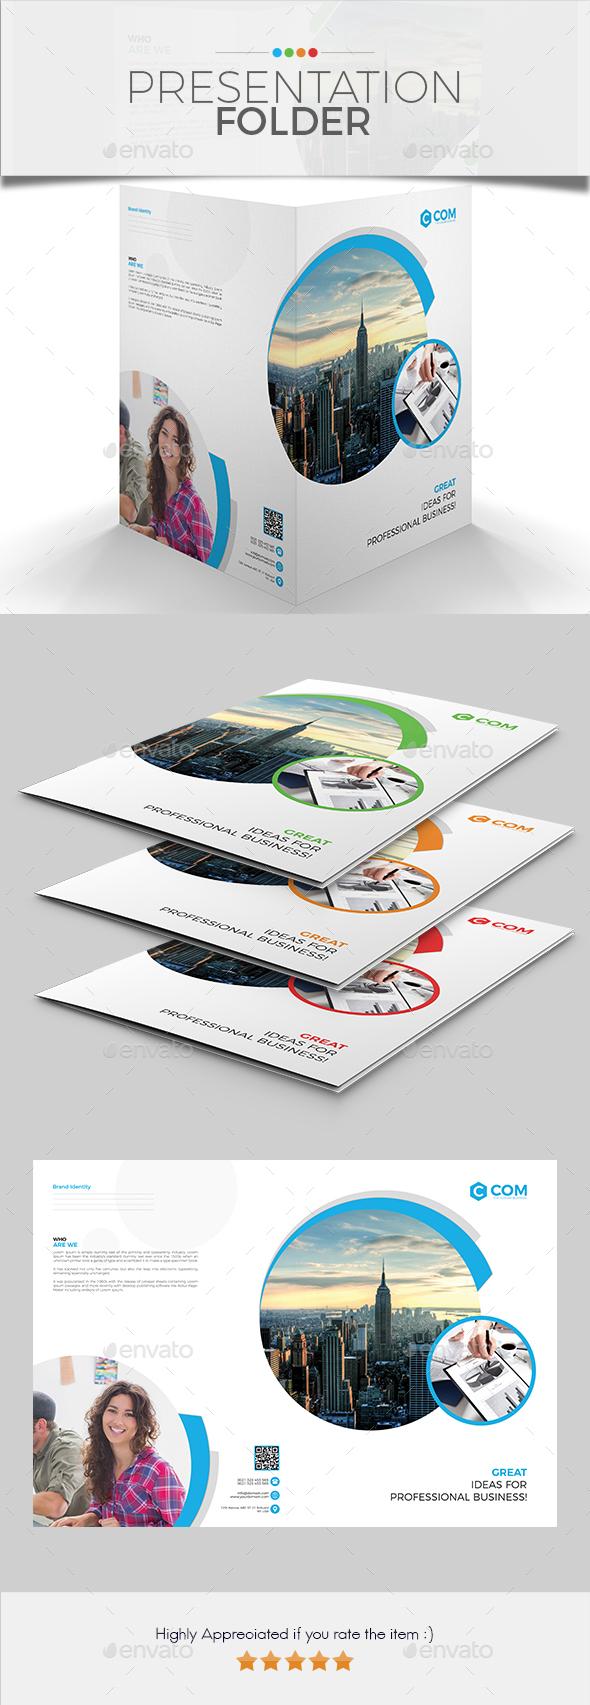 Presentation Folder 02 - Stationery Print Templates